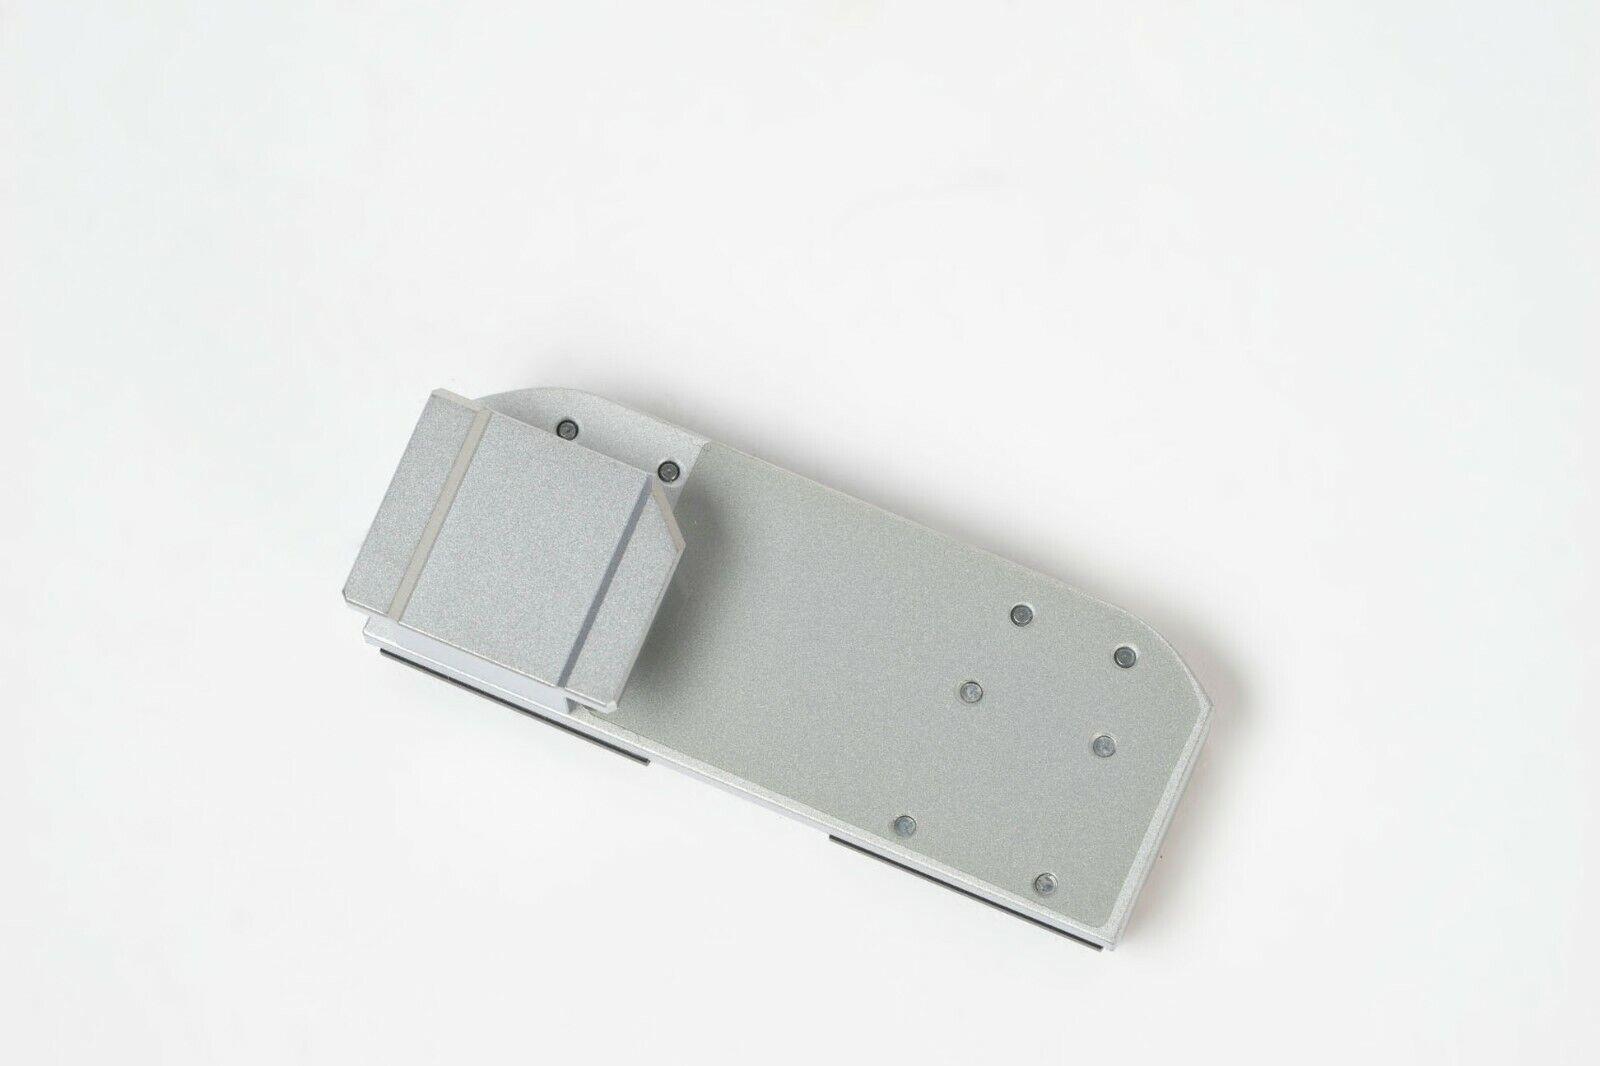 Voigtlander Double-Shoe Adapter - Type B from Japan for Bessa T or Nikon RF